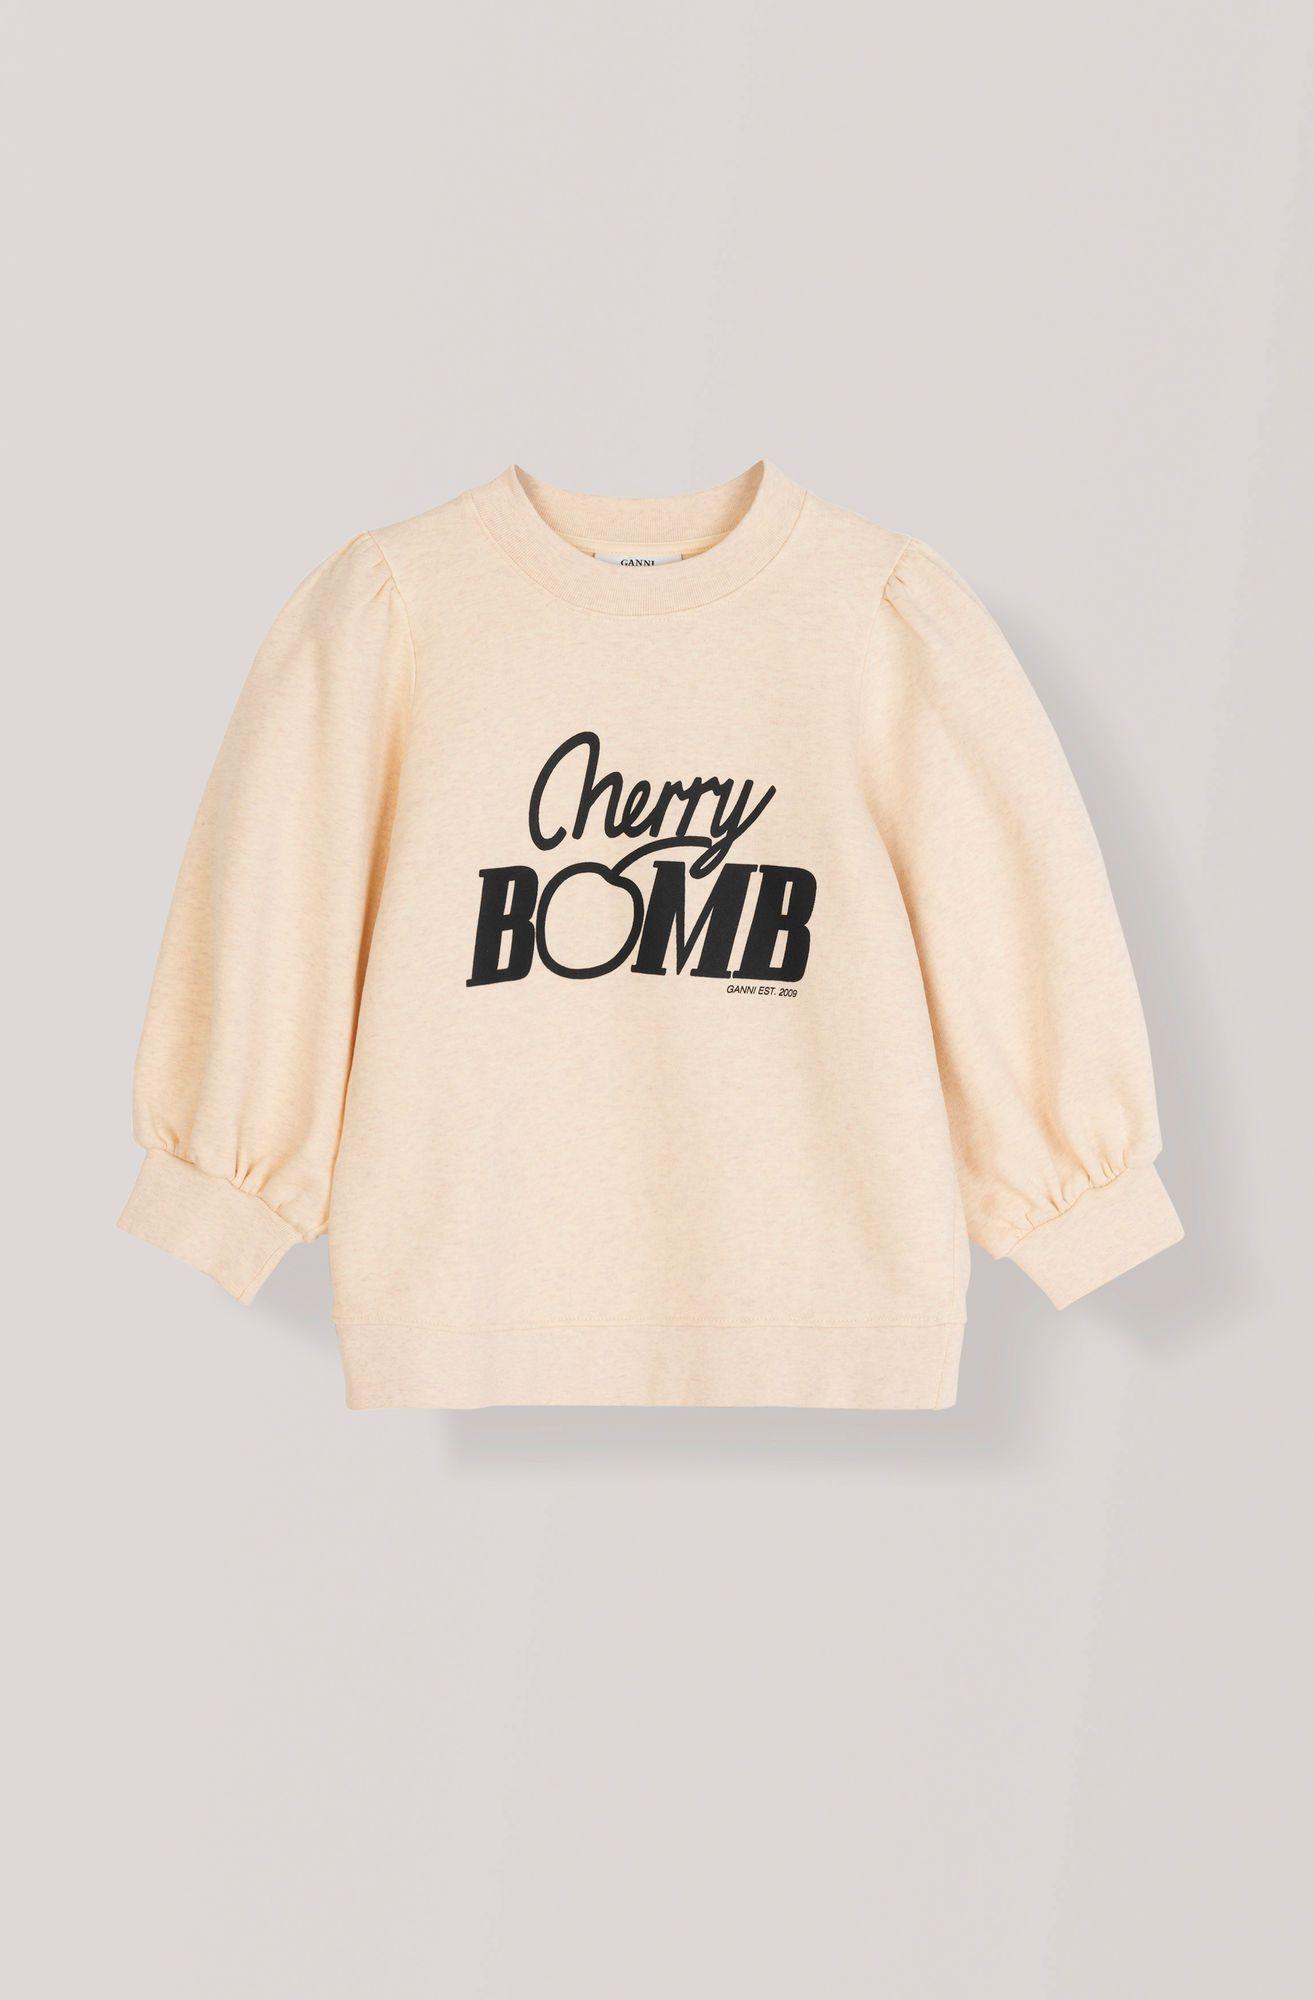 Lott Isoli Sweatshirt, Cherry Bomb, Anise Flower